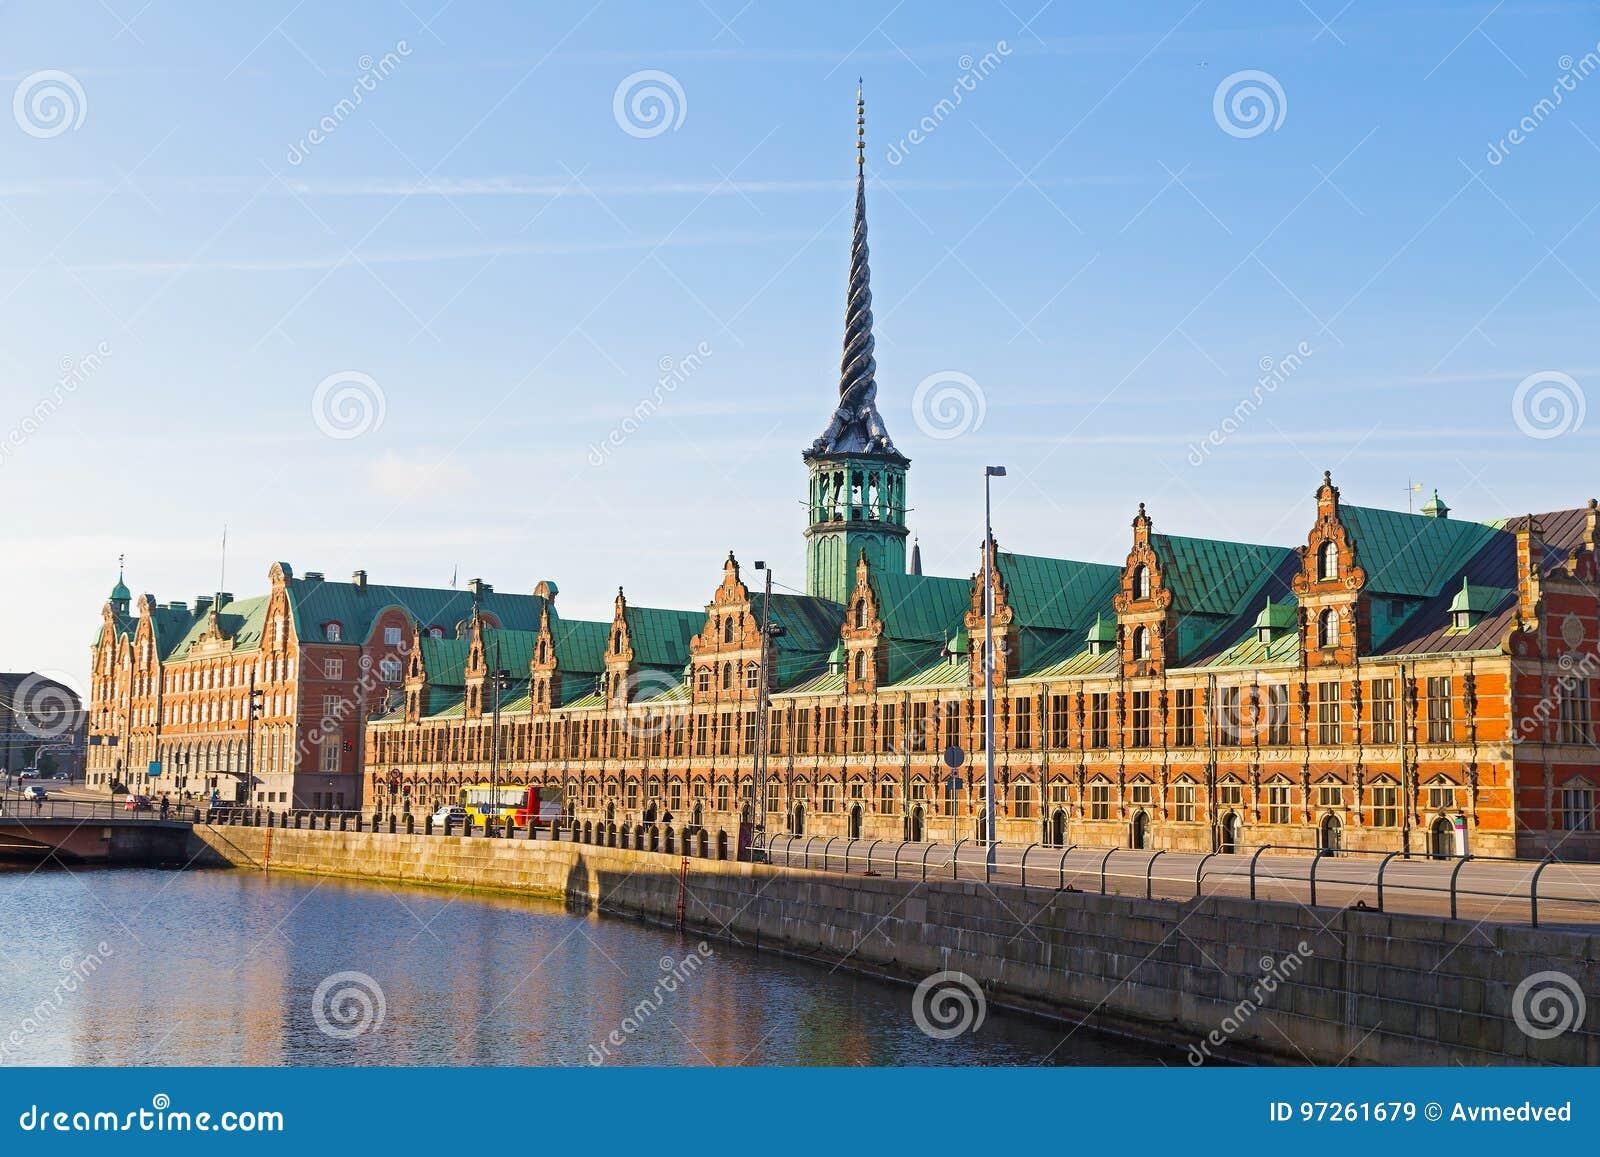 Denmark Stock Exchange